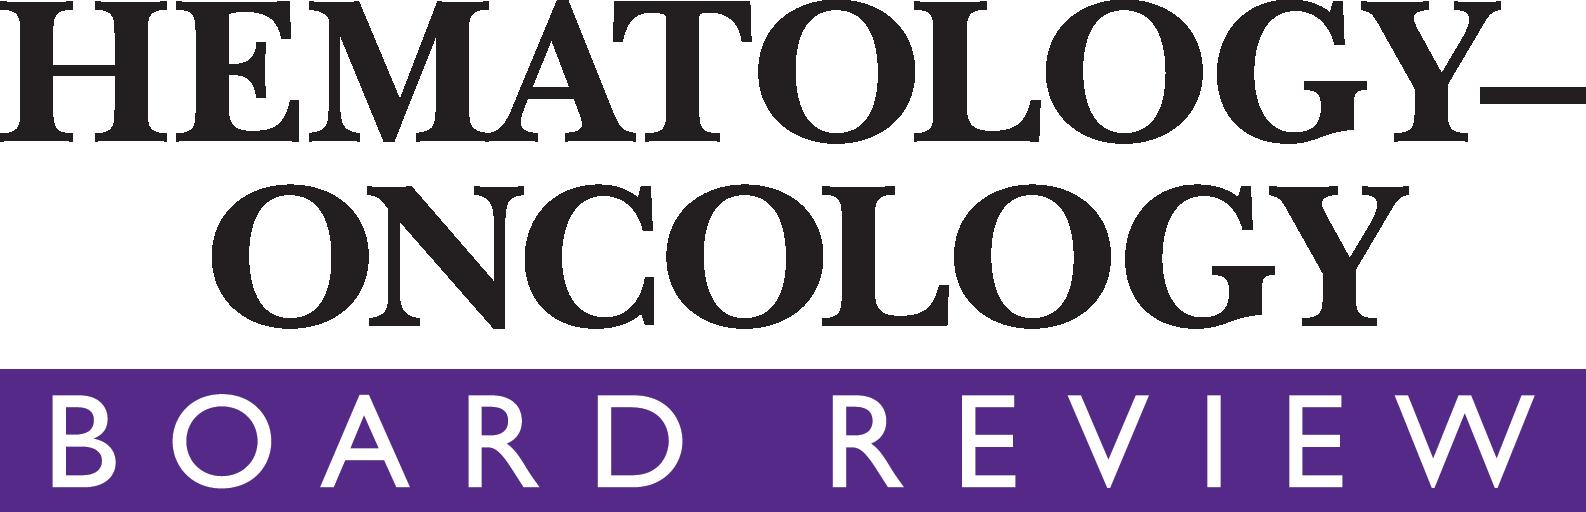 hemoncboardreview-logo